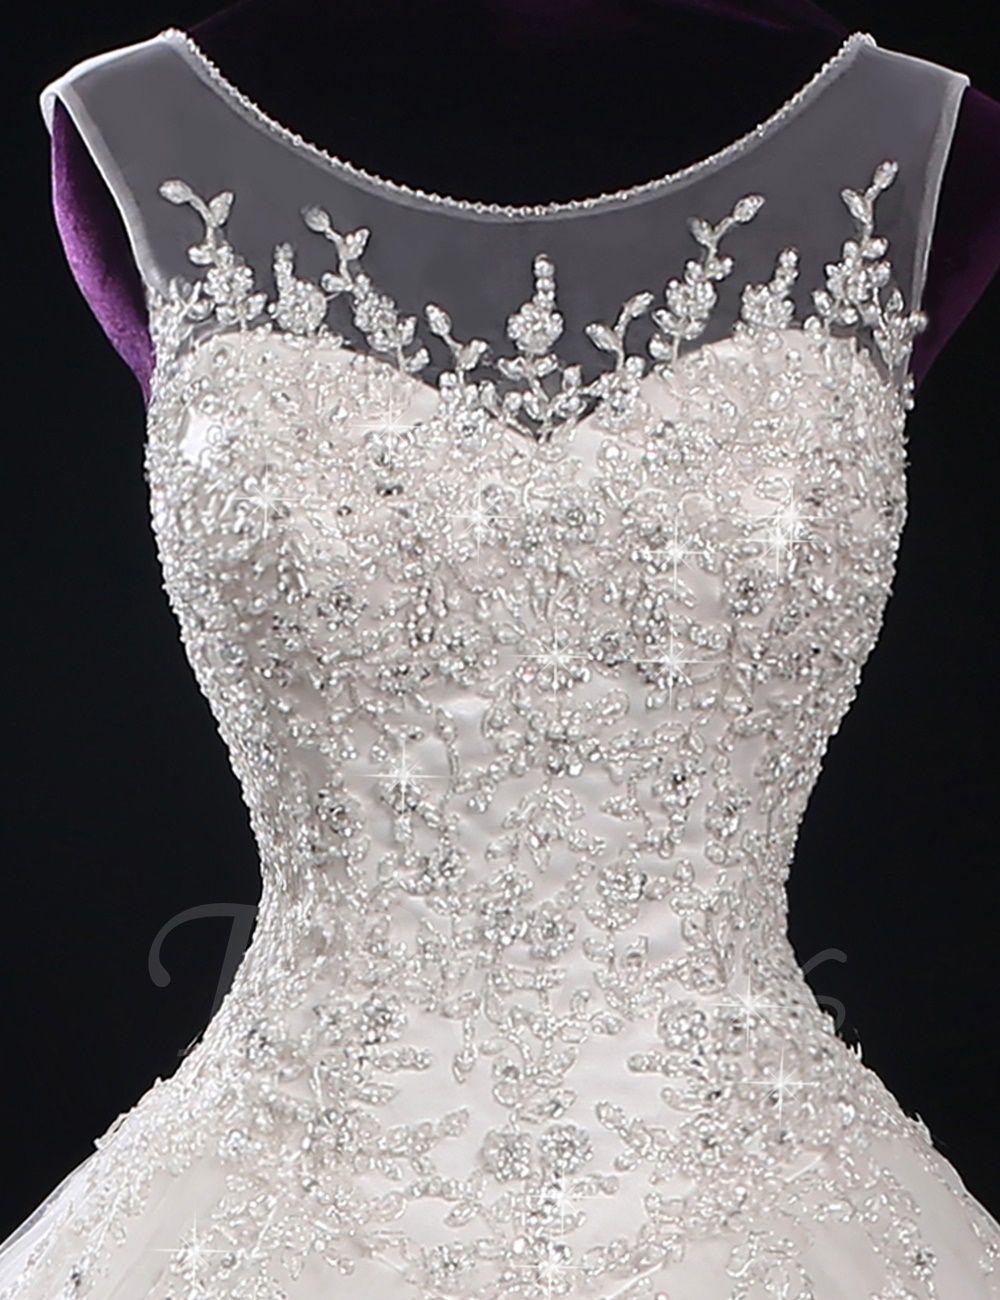 Scoop Neck Beading Appliques Plus Size Wedding Dress Wedding Dresses Beaded Ball Gowns Wedding Wedding Dresses Ebay [ 1300 x 1000 Pixel ]